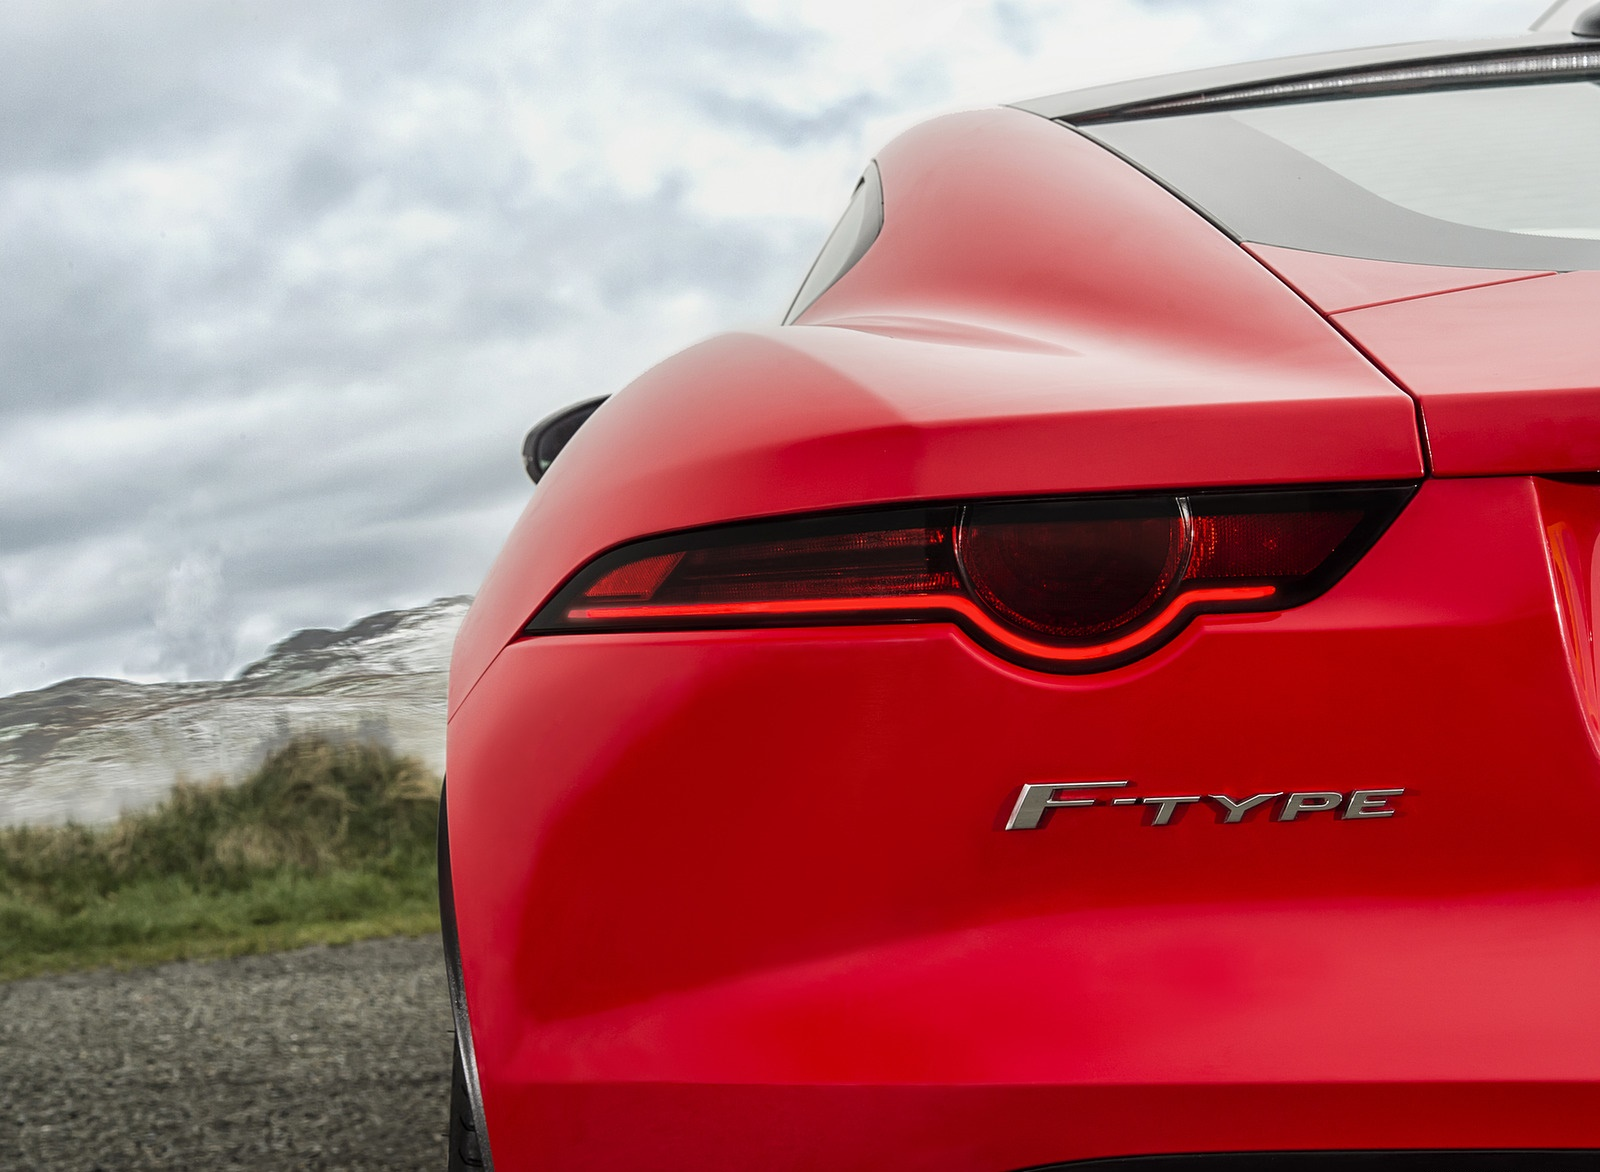 2018 Jaguar F-TYPE 2.0T Tail Light Wallpapers (13)